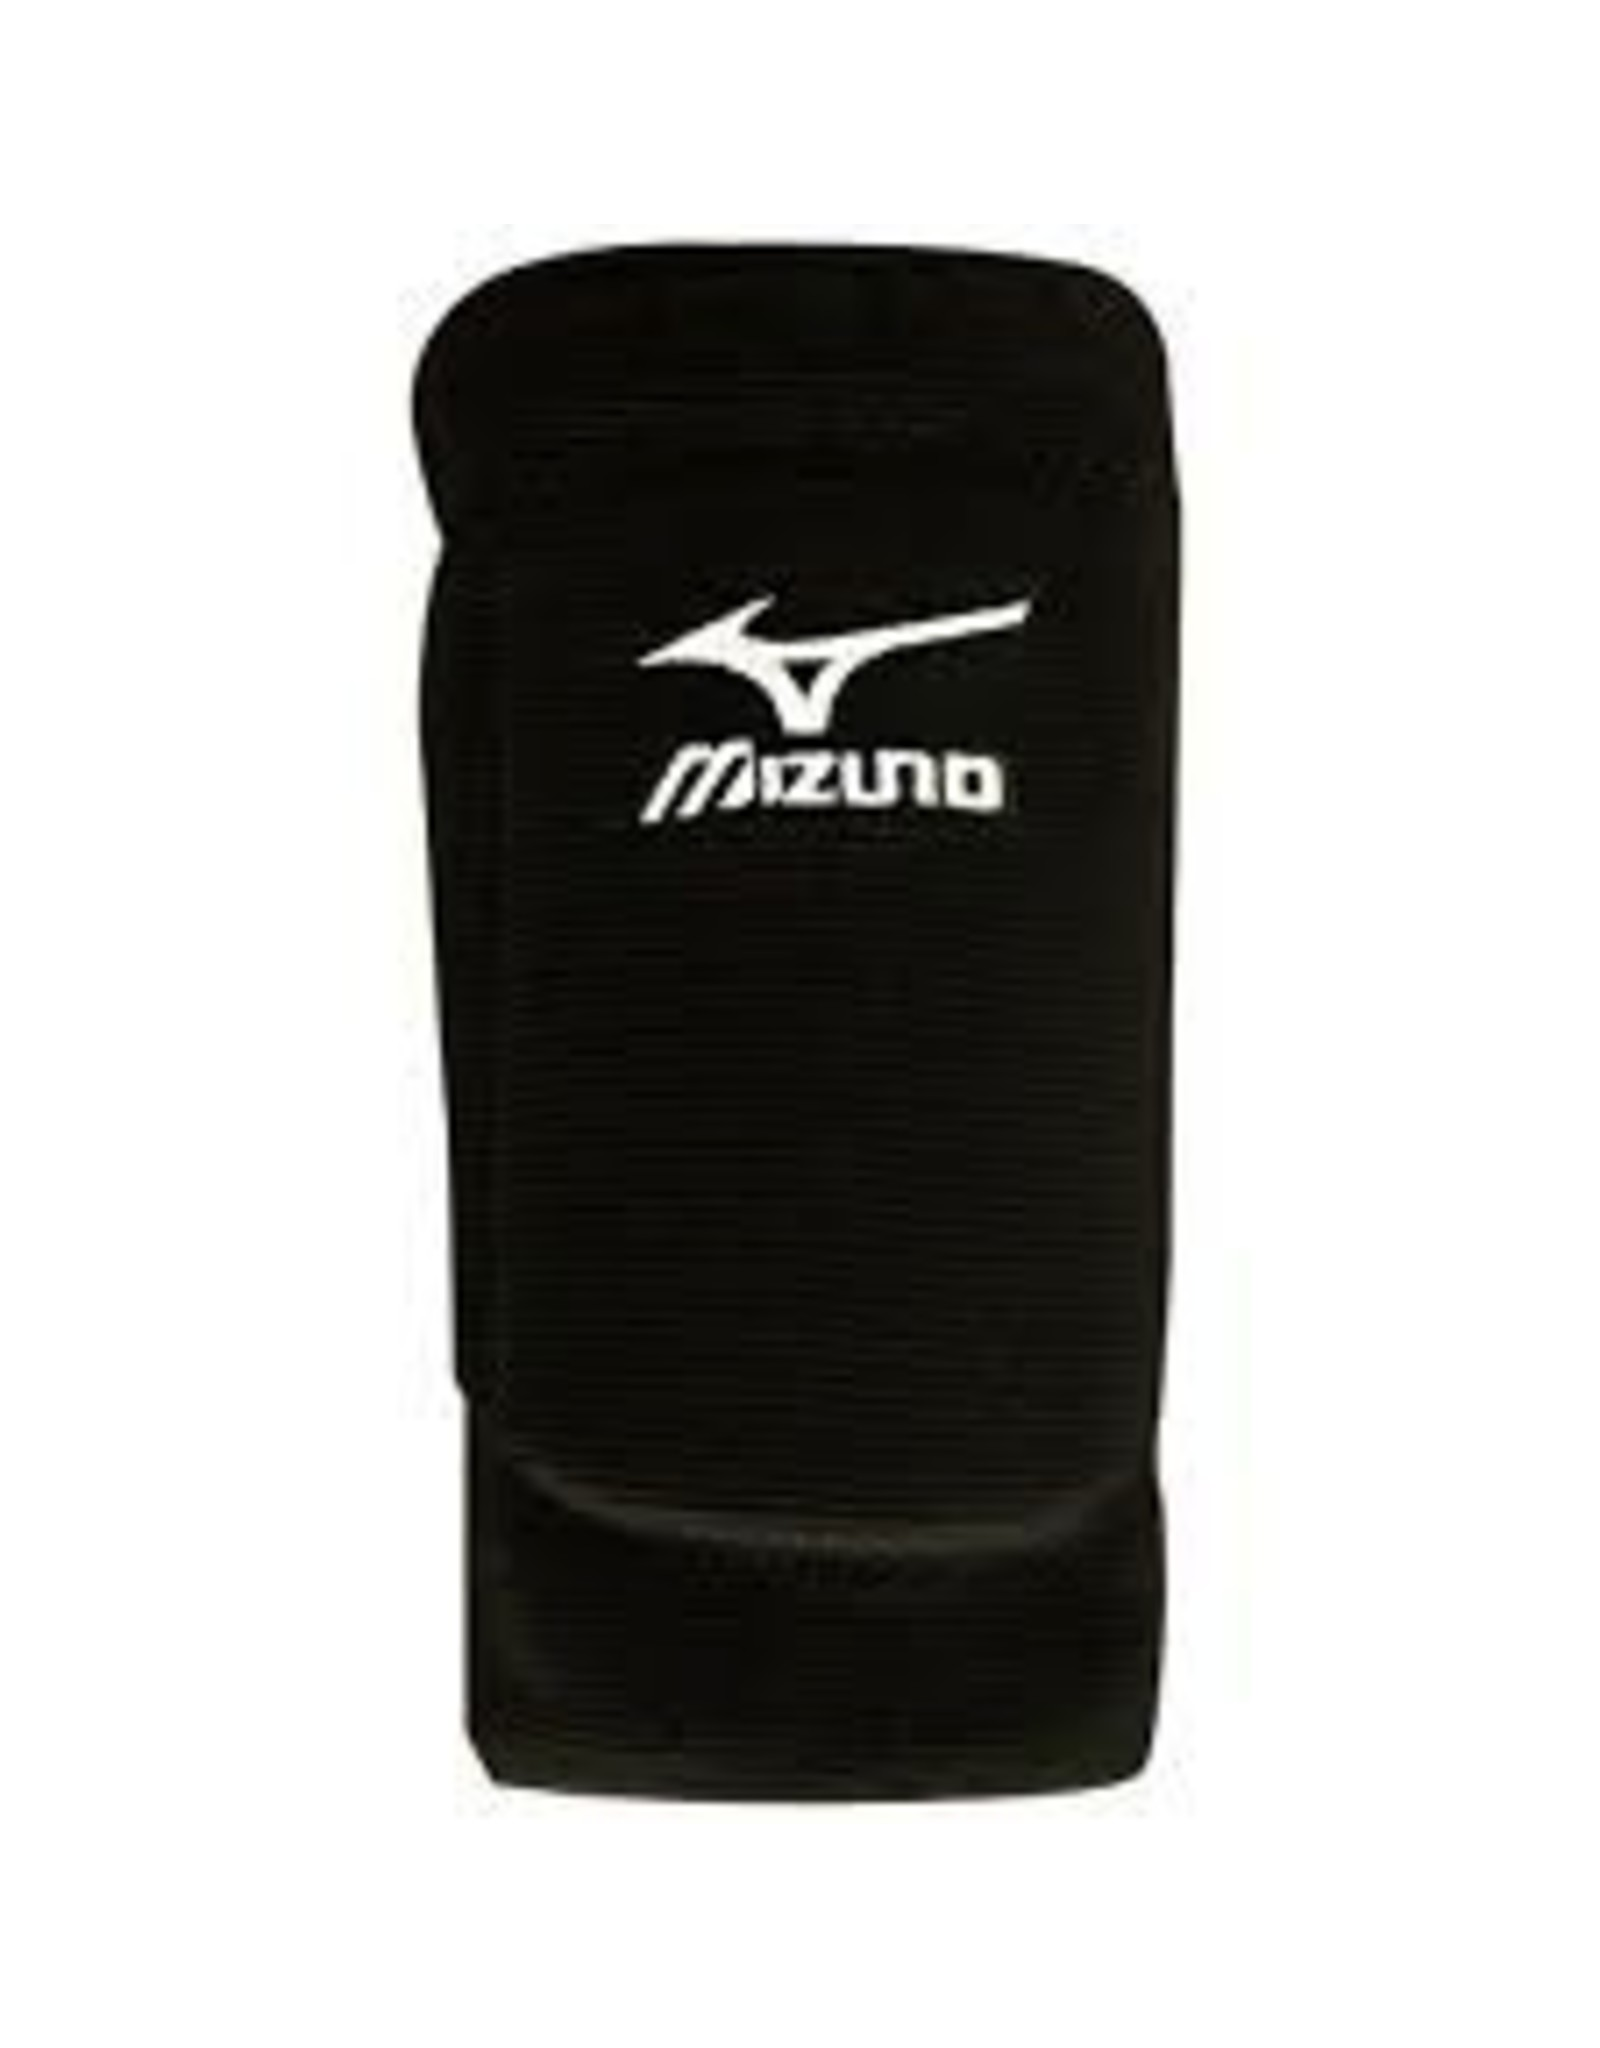 Mizuno T10 Plus Kneepads Volleyball Knee pads